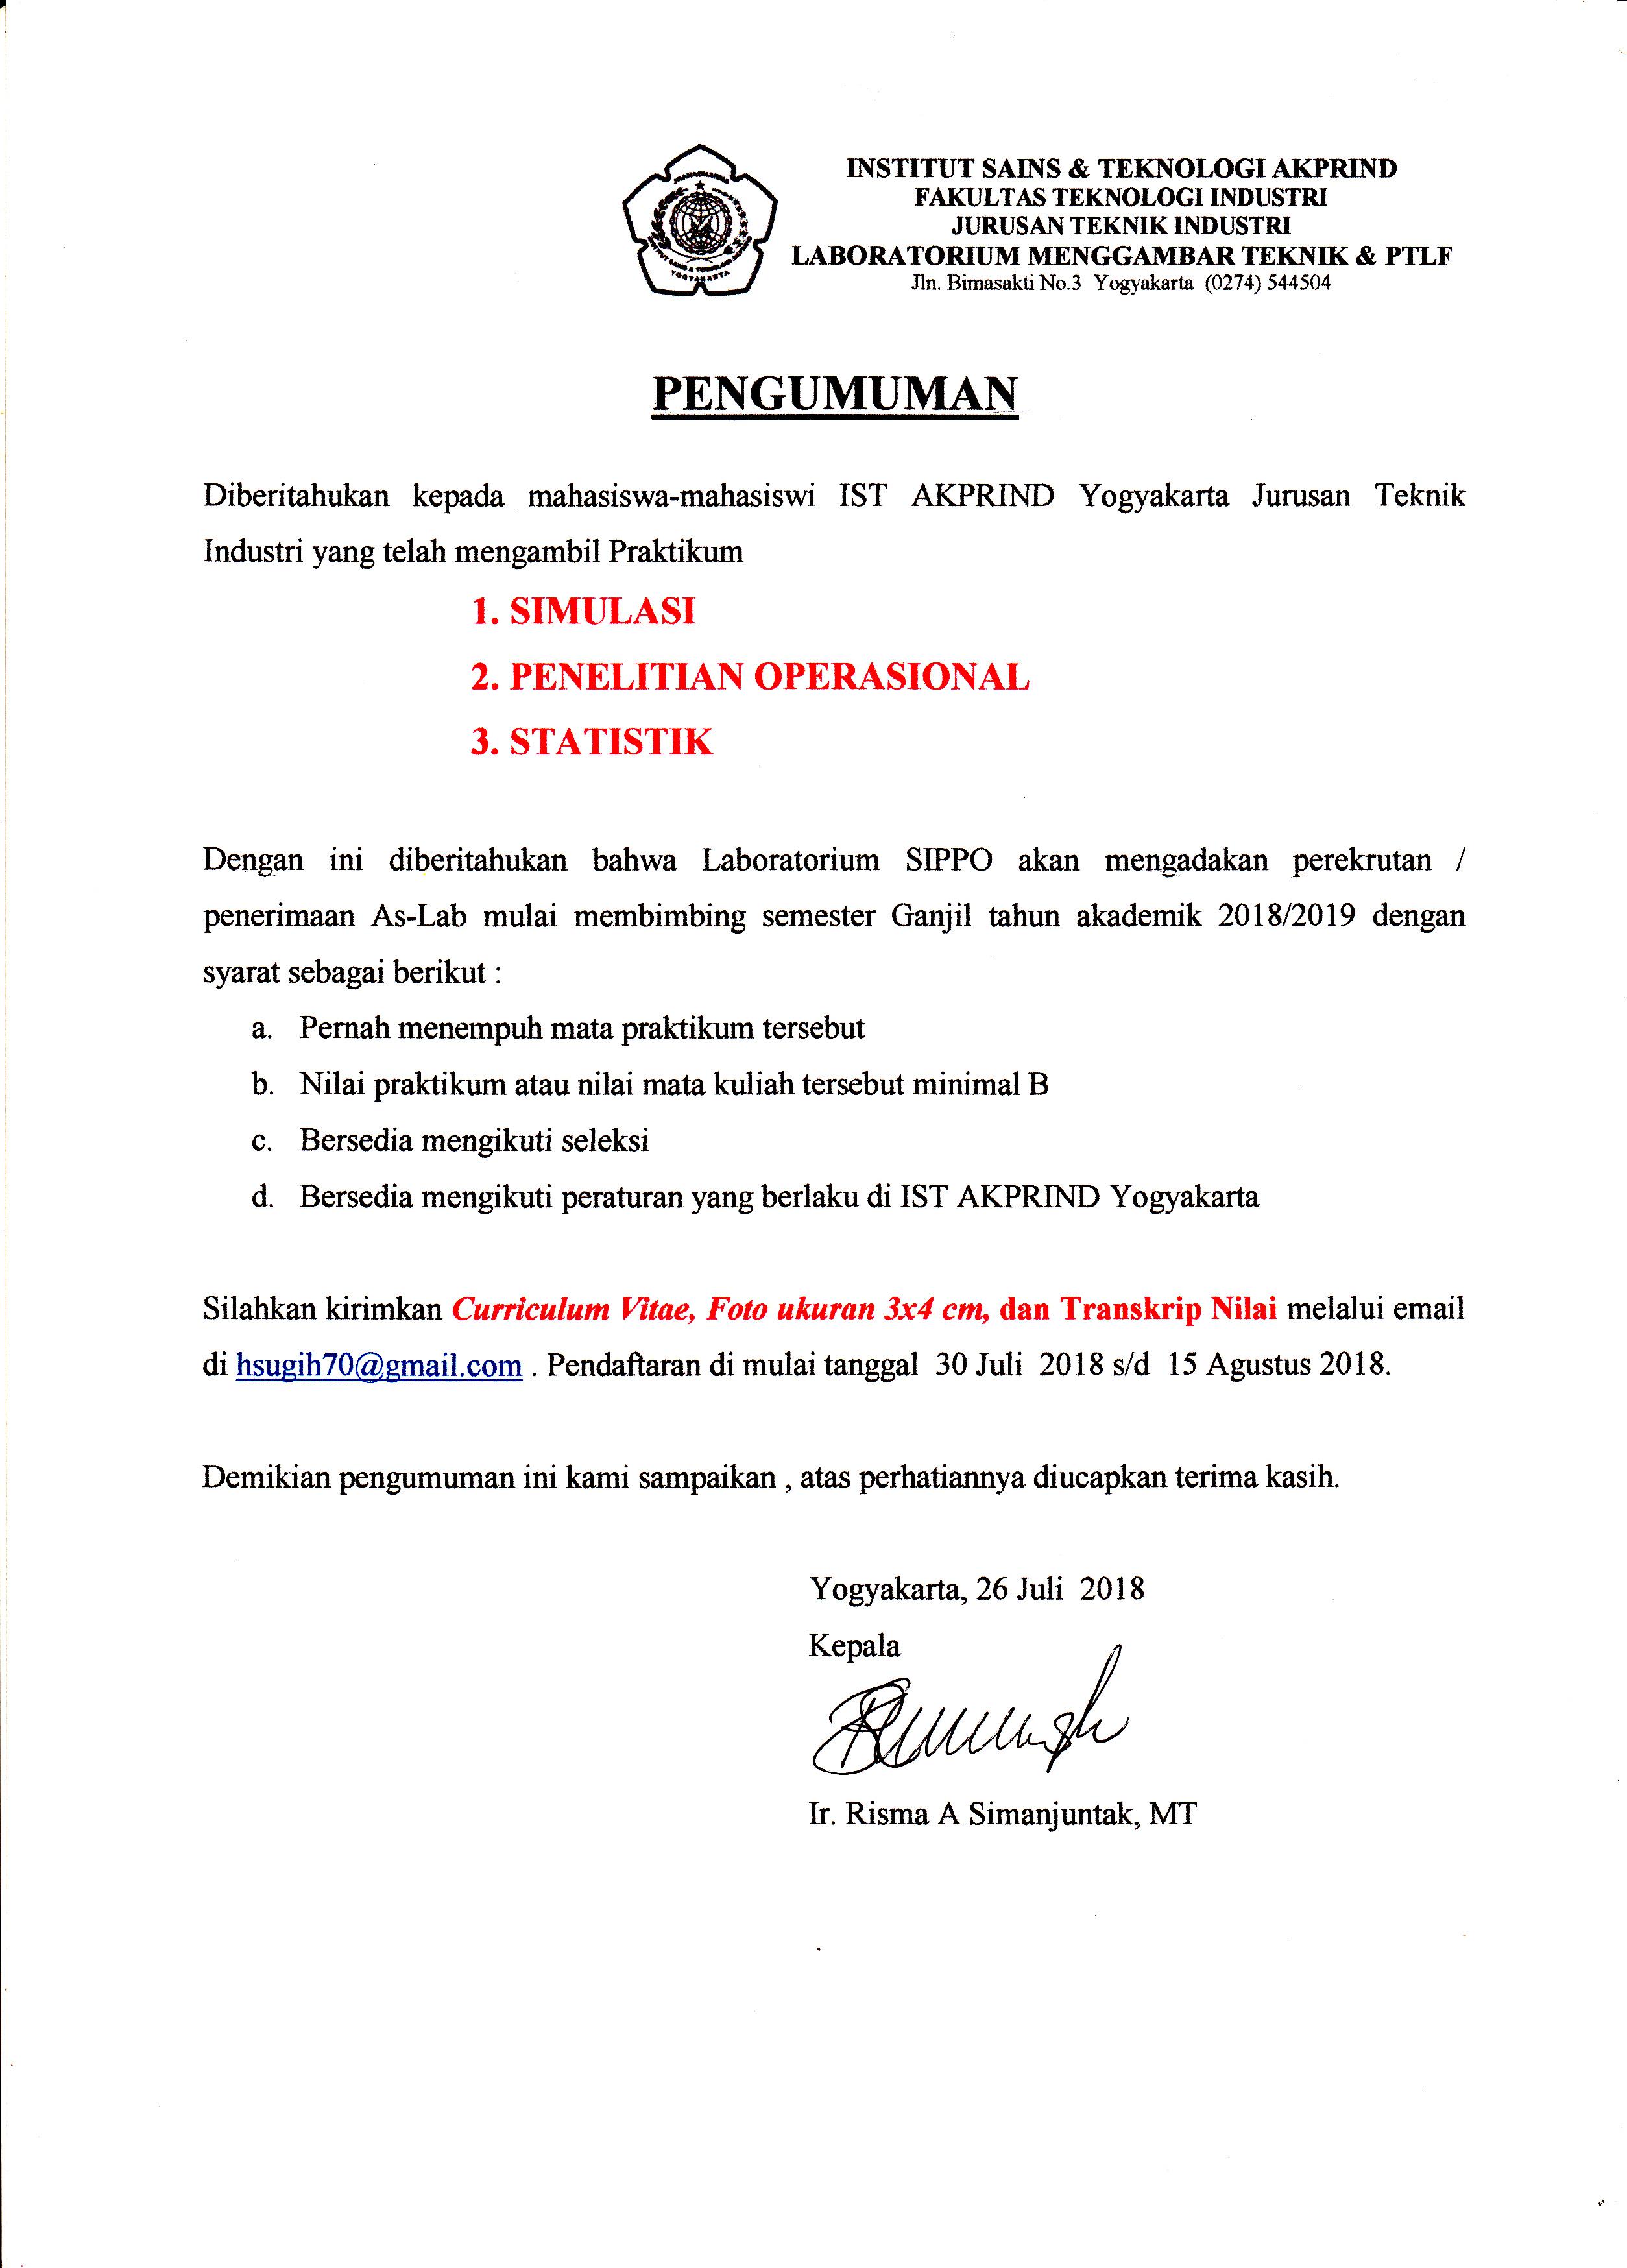 Pendaftaran aslab sippo semester Ganjil 2018/2019 Teknik Industri IST AKPRIND Yogyakarta